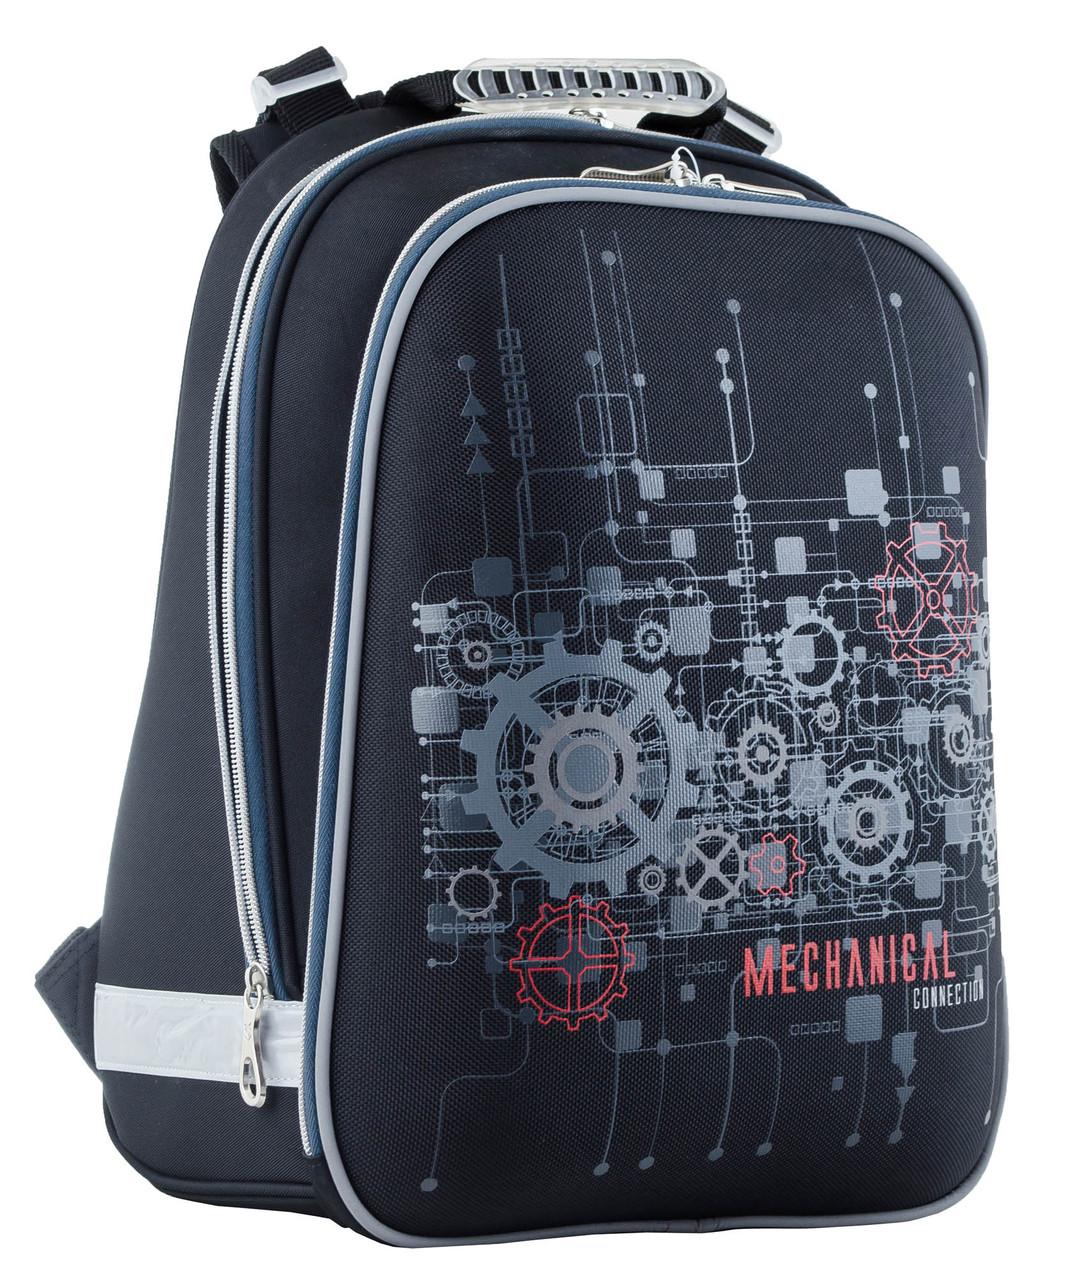 Рюкзак каркасный  H-12 Mechanical, 38*29*15, фото 1